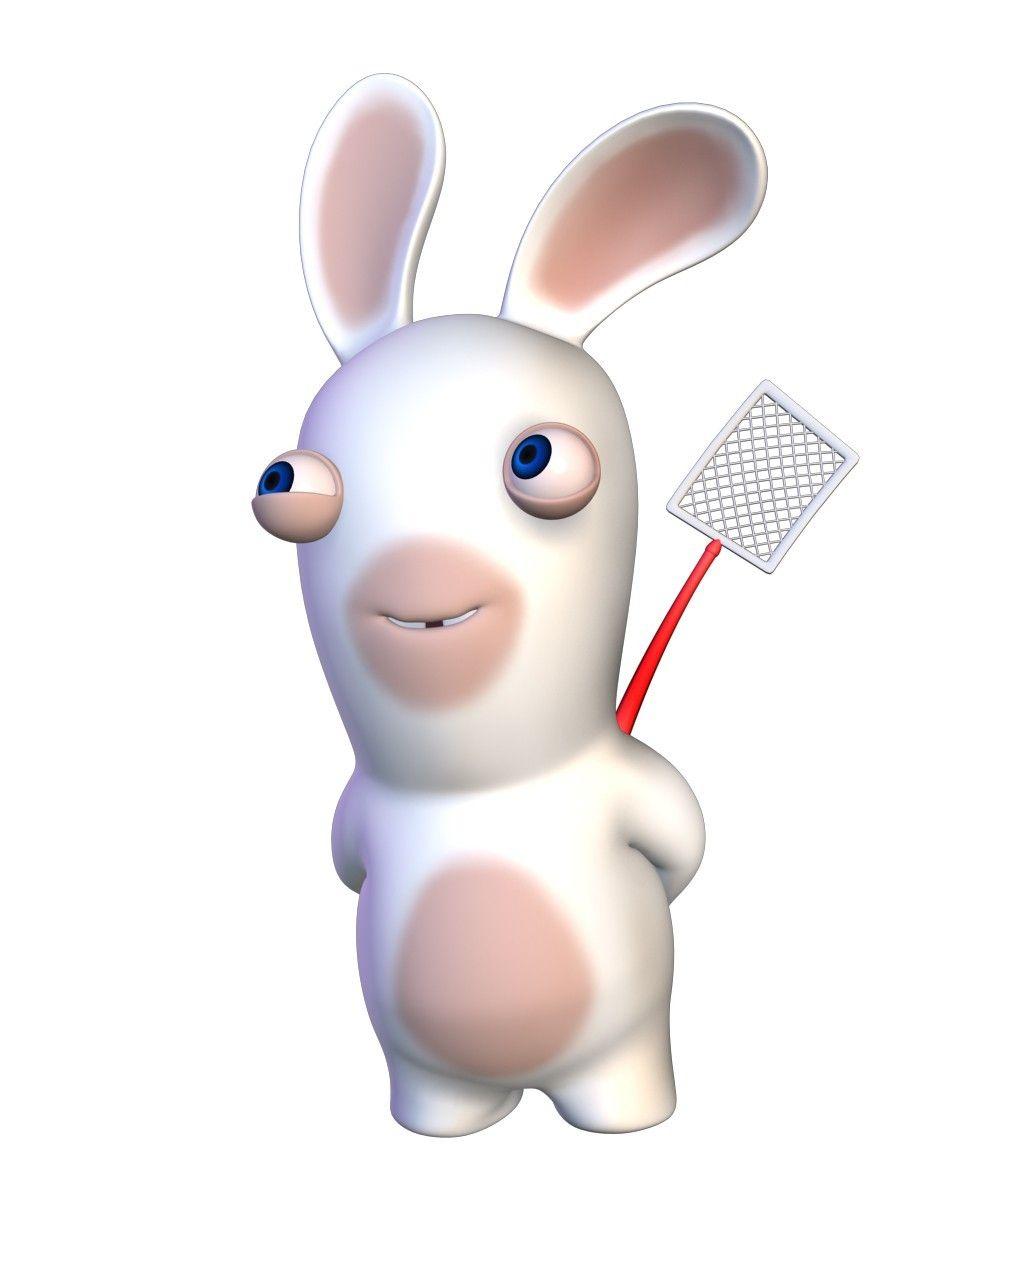 Lapin Crétin Attrape Mouches Lapin Crétin Rabbit Glitter